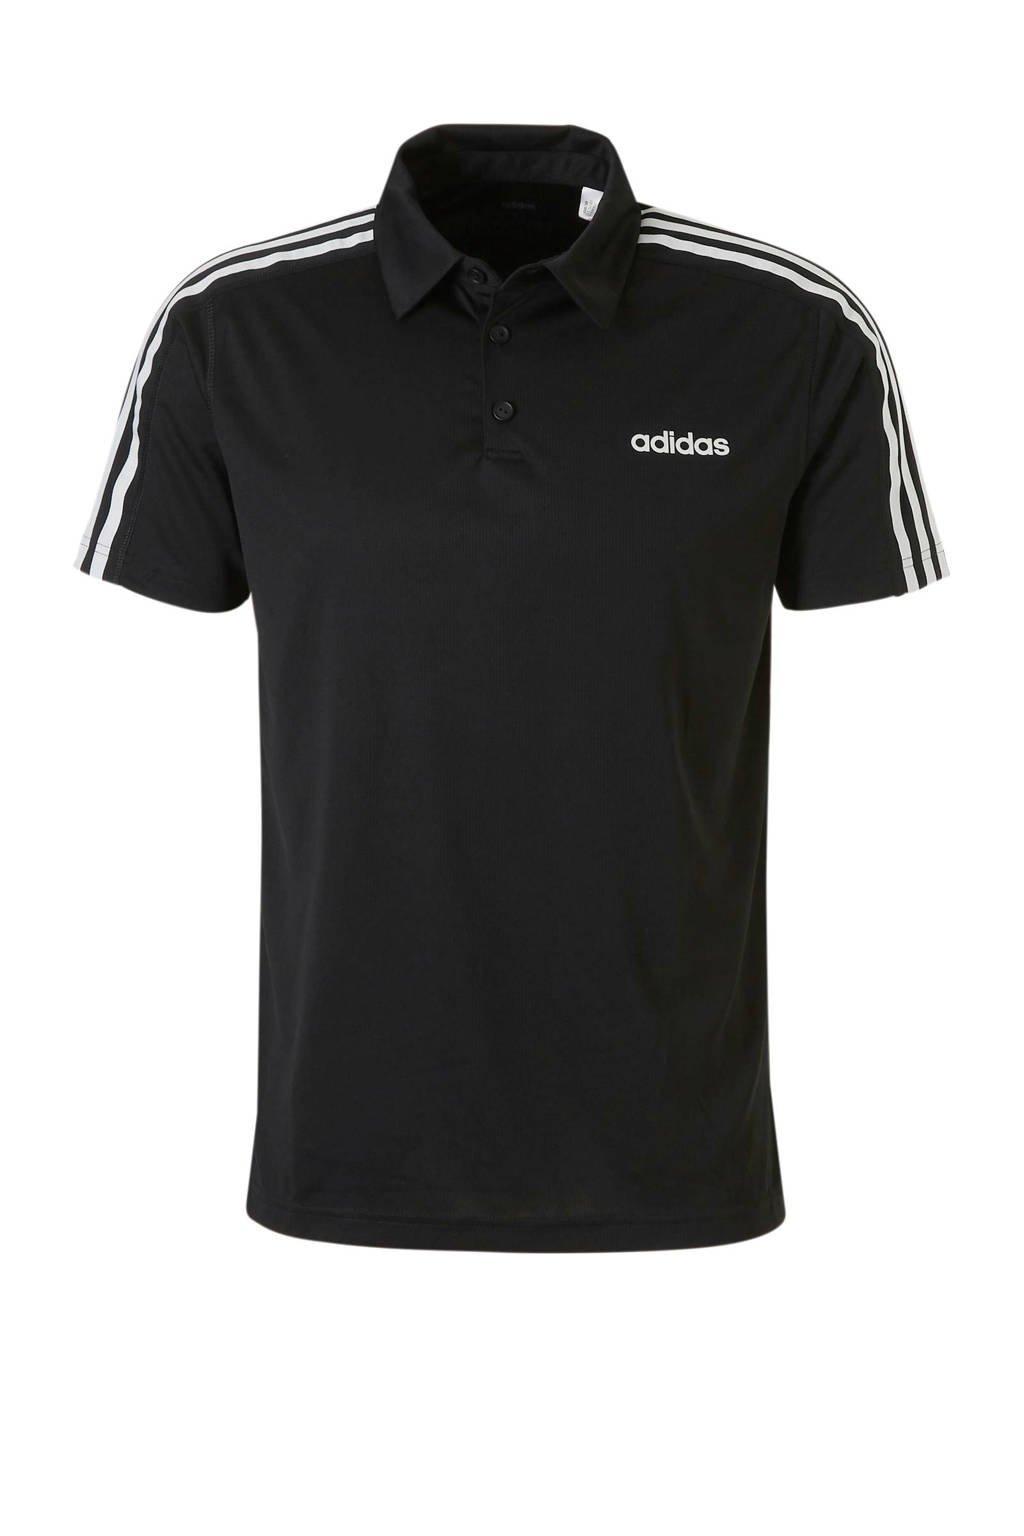 adidas performance   sportpolo zwart, Zwart